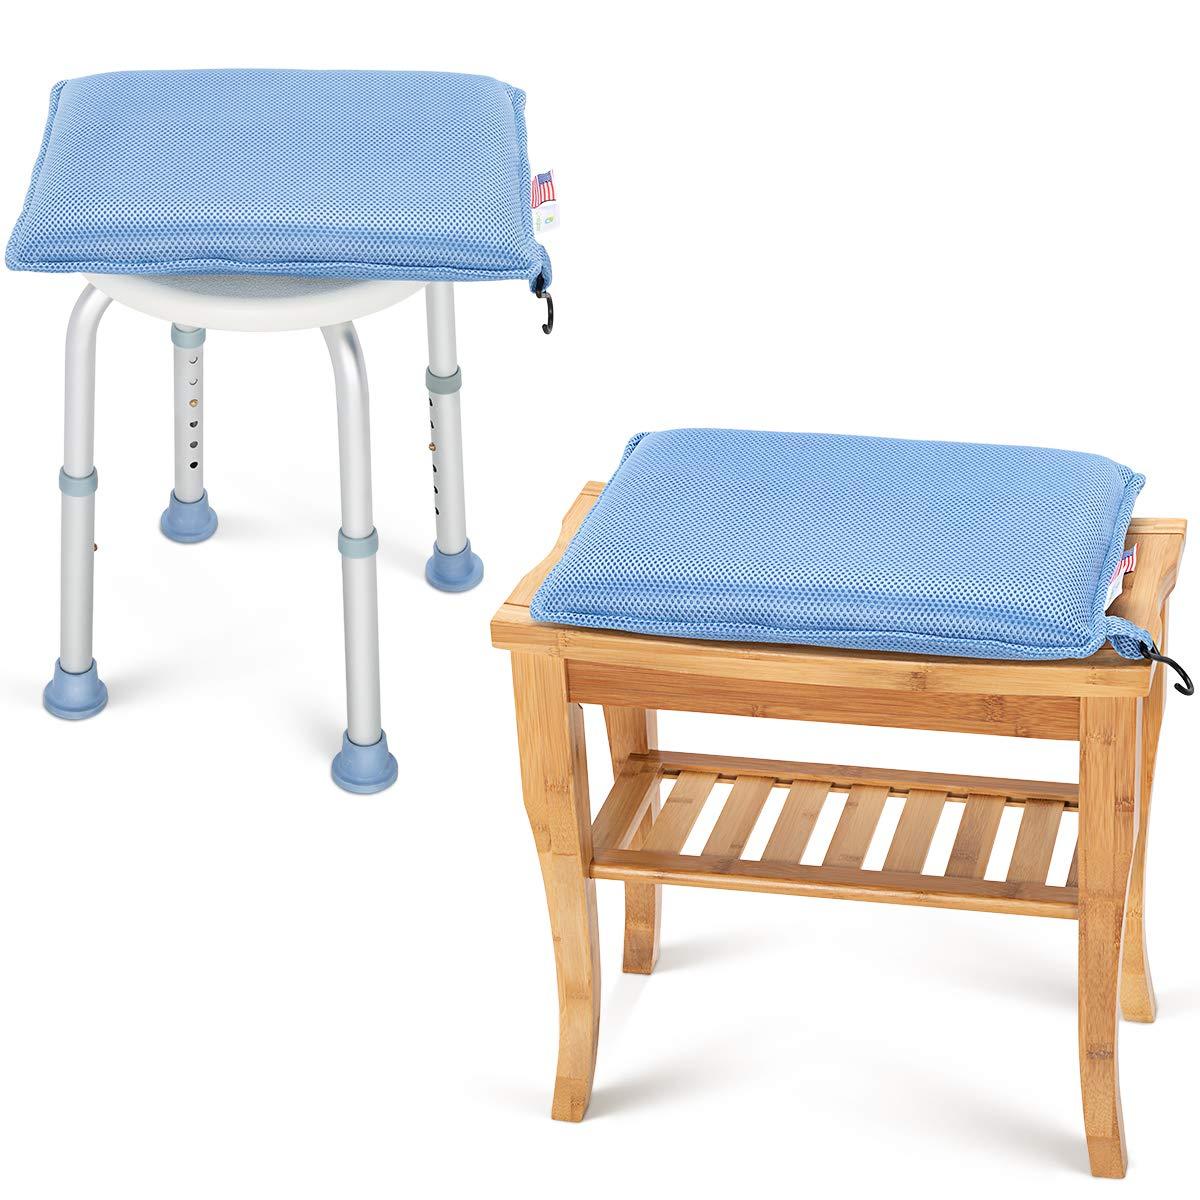 OasisSpace Shower Chair Cushion, Transfer Bench Shower Stool Bath Seat Cushion for Elderly, Senior, Handicap & Disabled, Soft